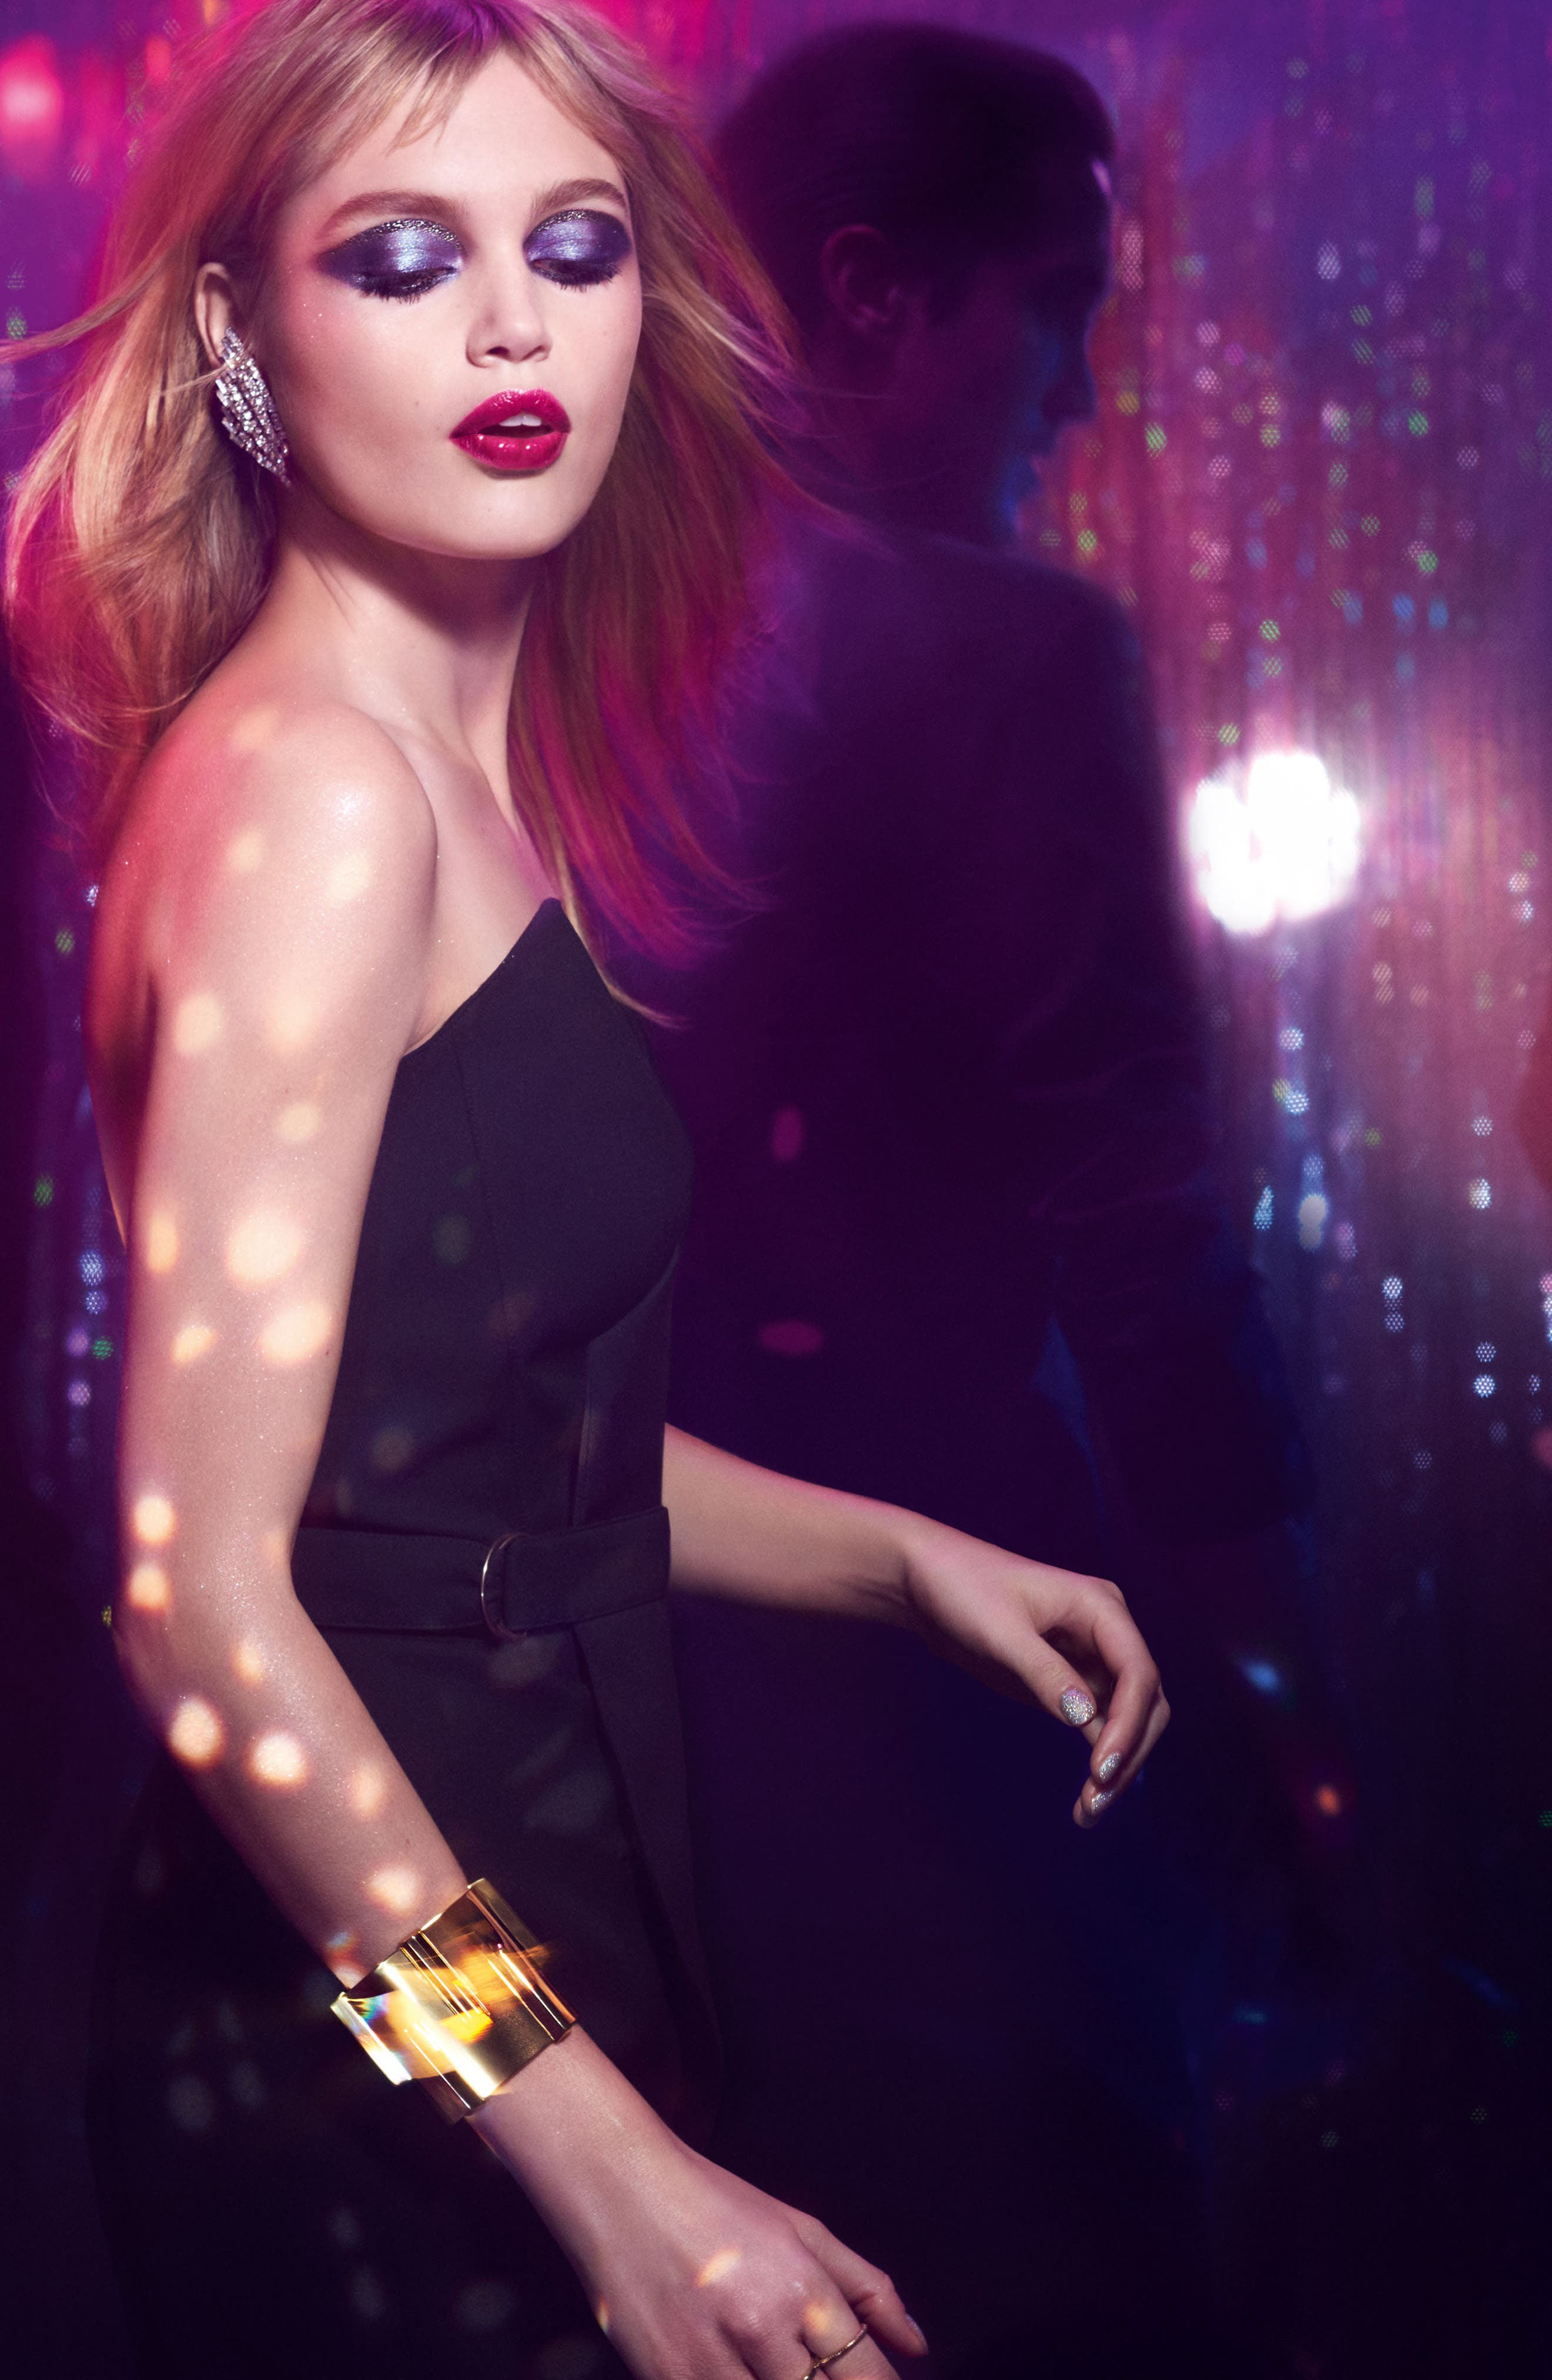 Alternate Image 2  - Yves Saint Laurent Night 54 Couture Variation Palette for Eyes & Lips